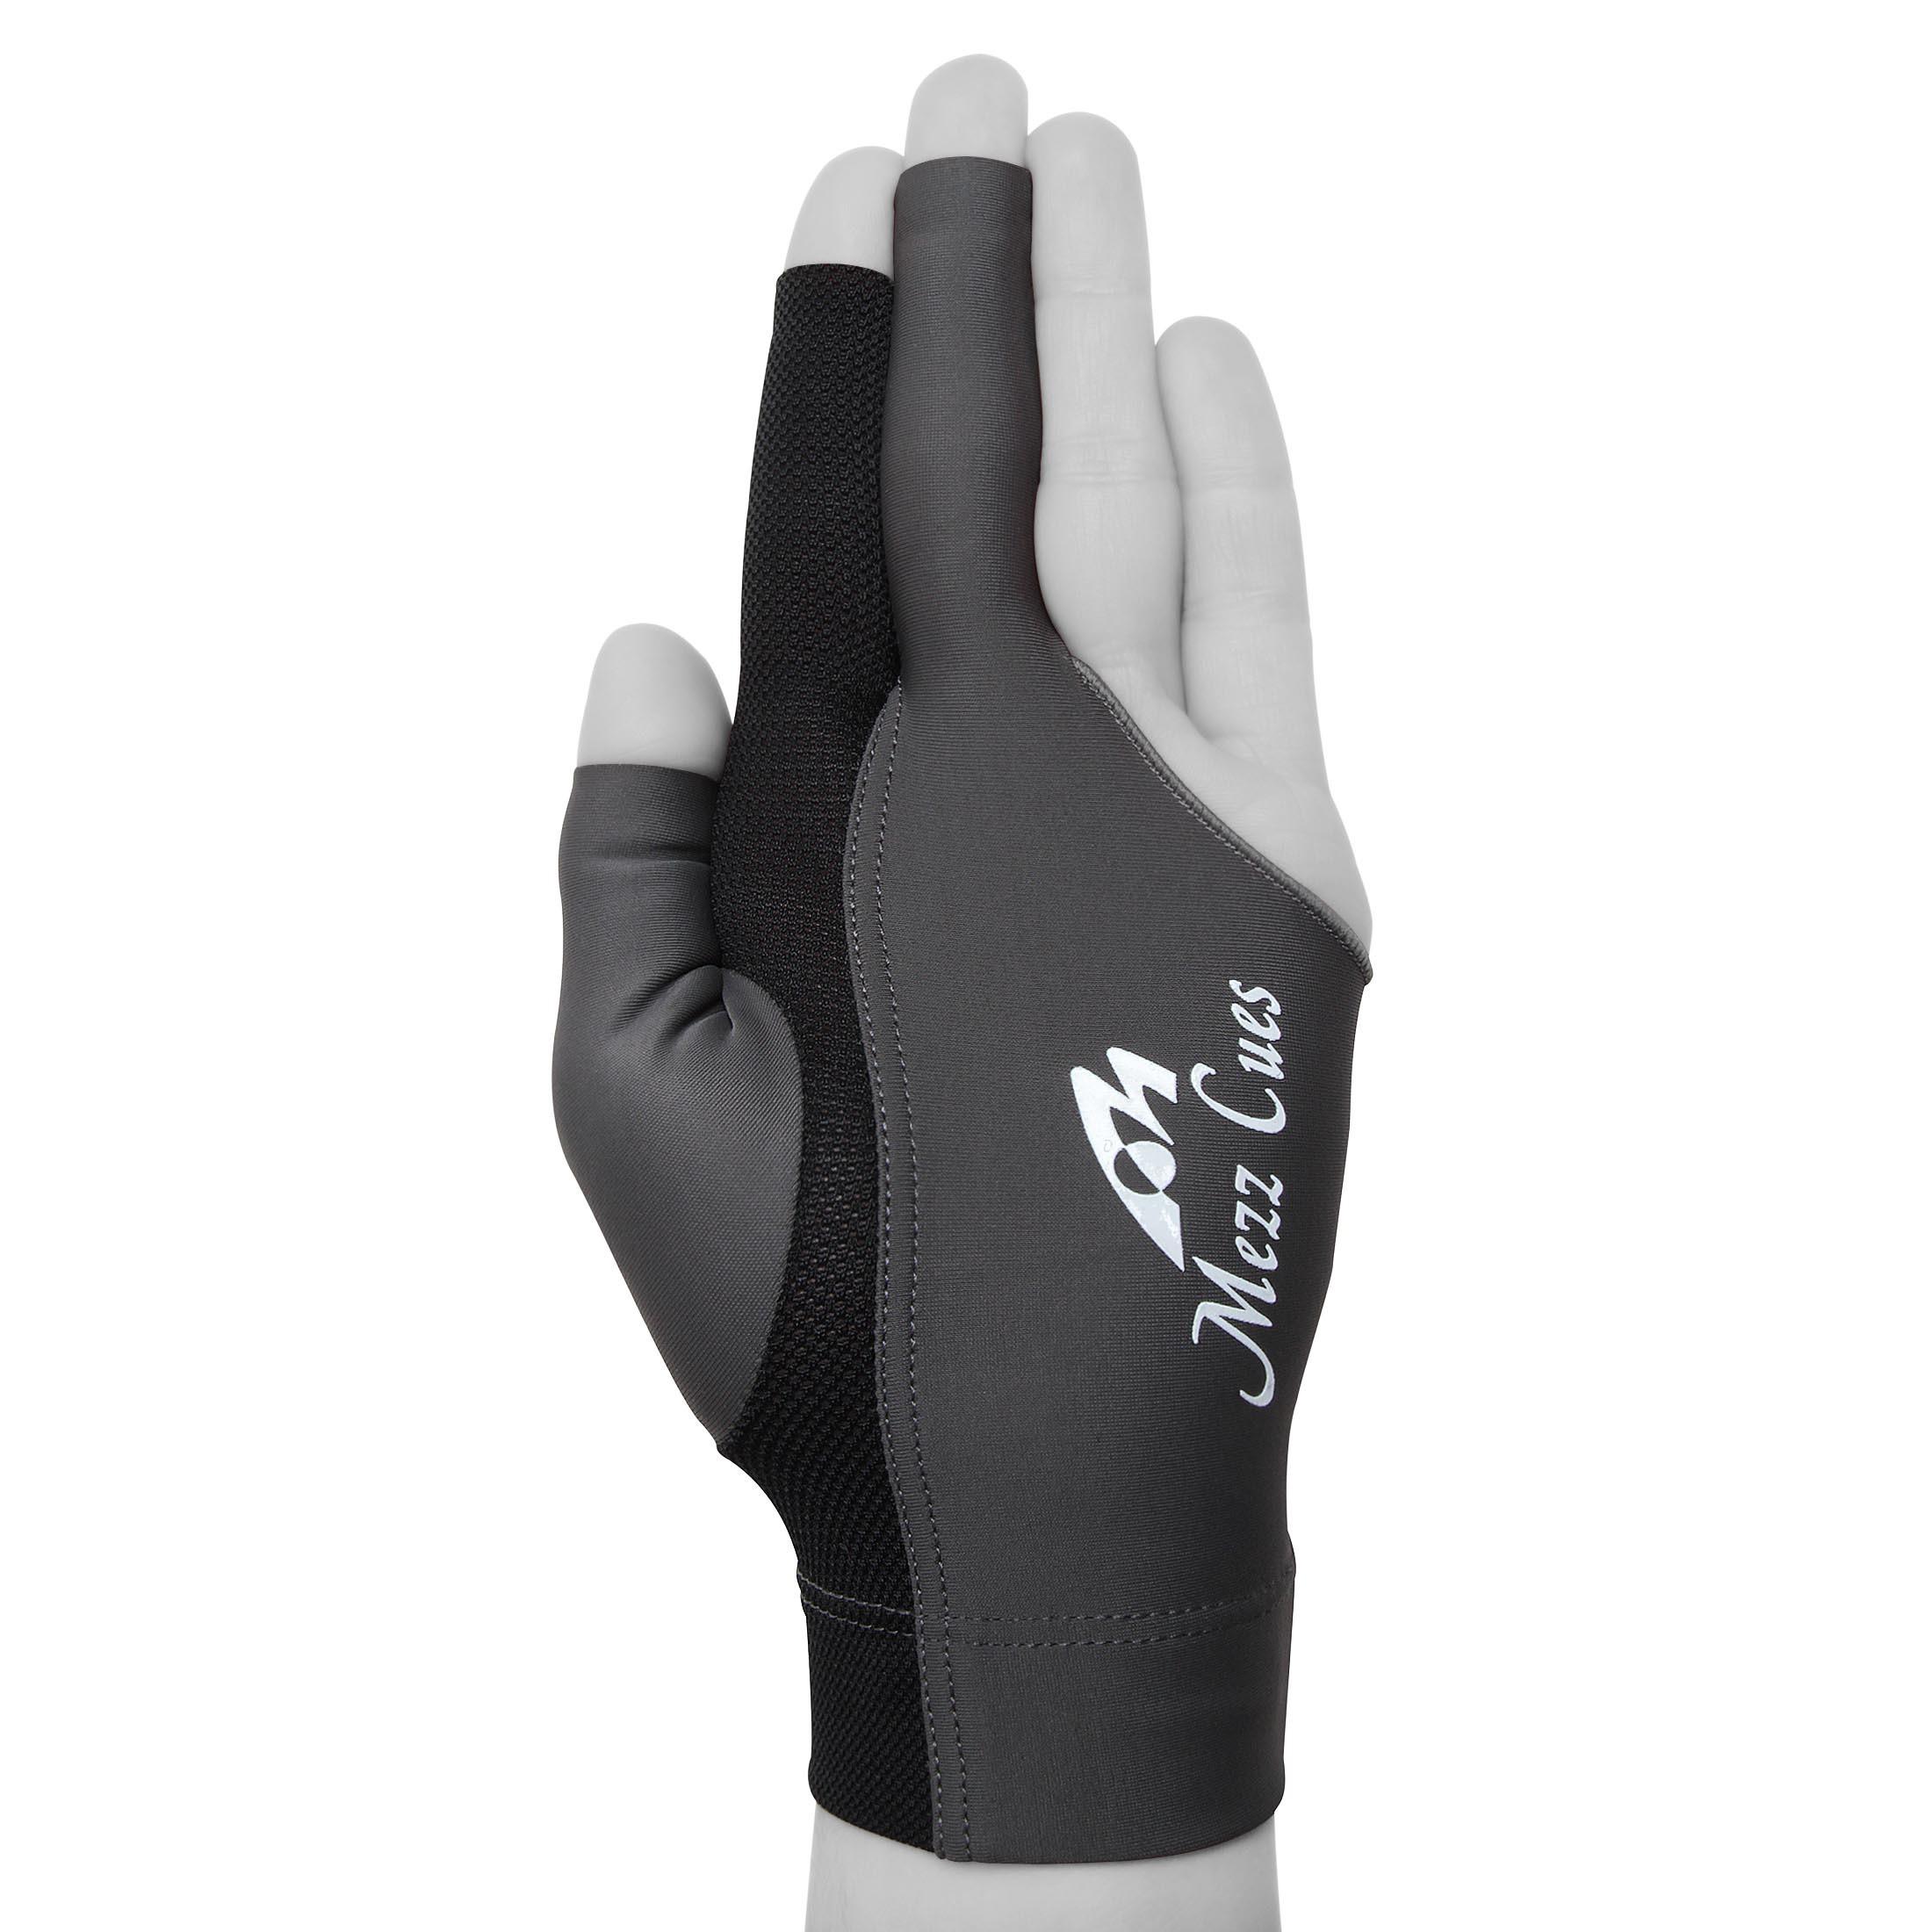 Перчатка MEZZ Premium MGR-H серая L/XL